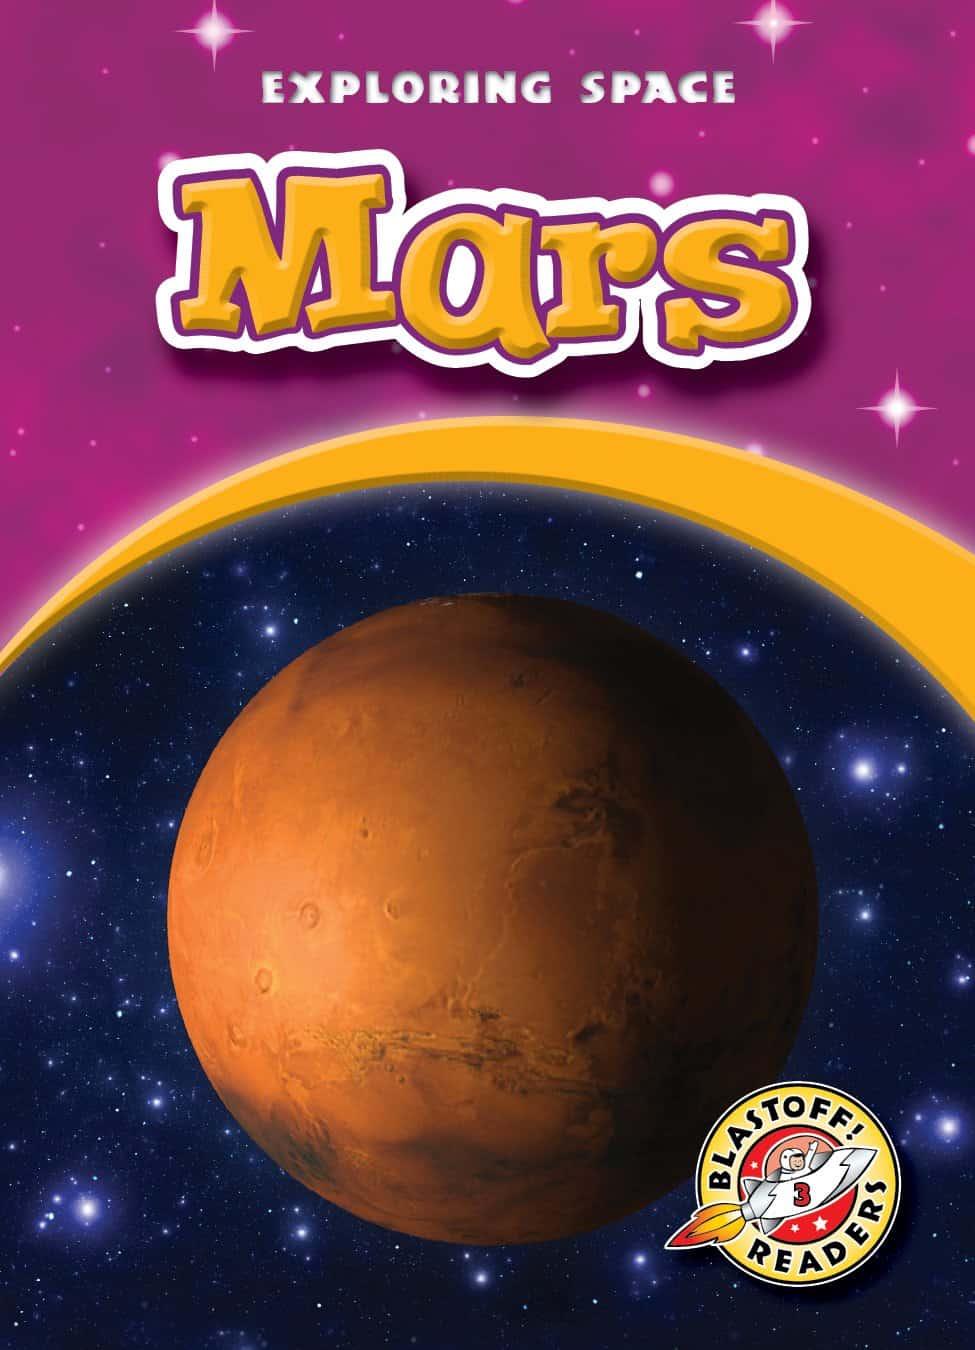 mars rover book - photo #18